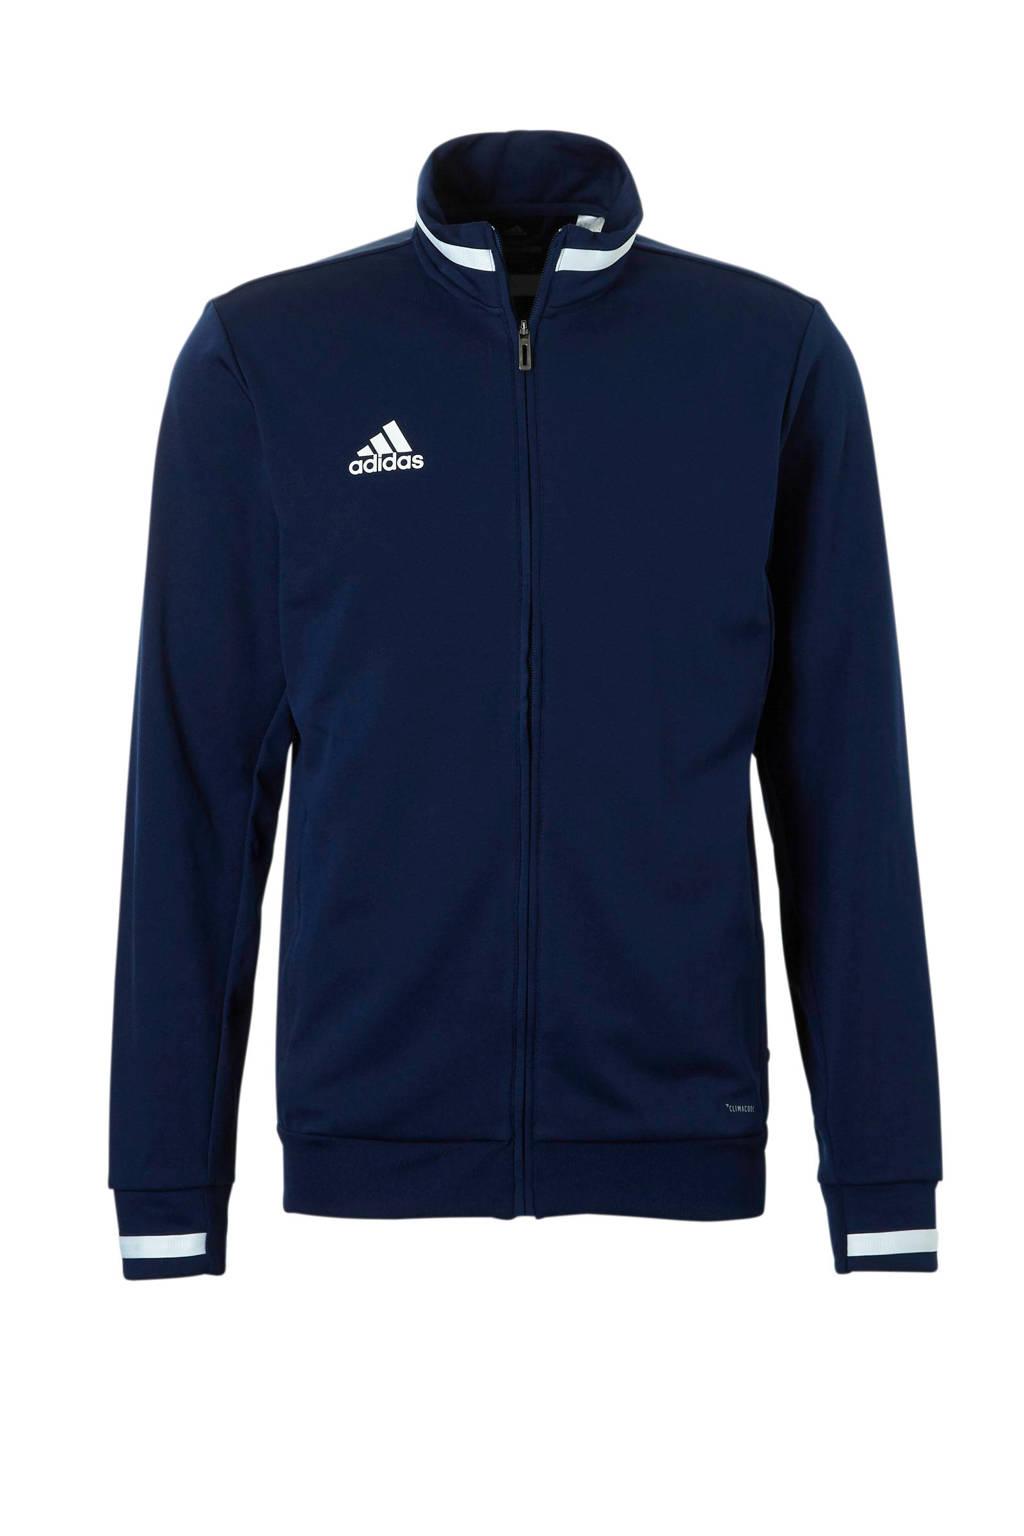 adidas performance   sportvest donkerblauw, Donkerblauw